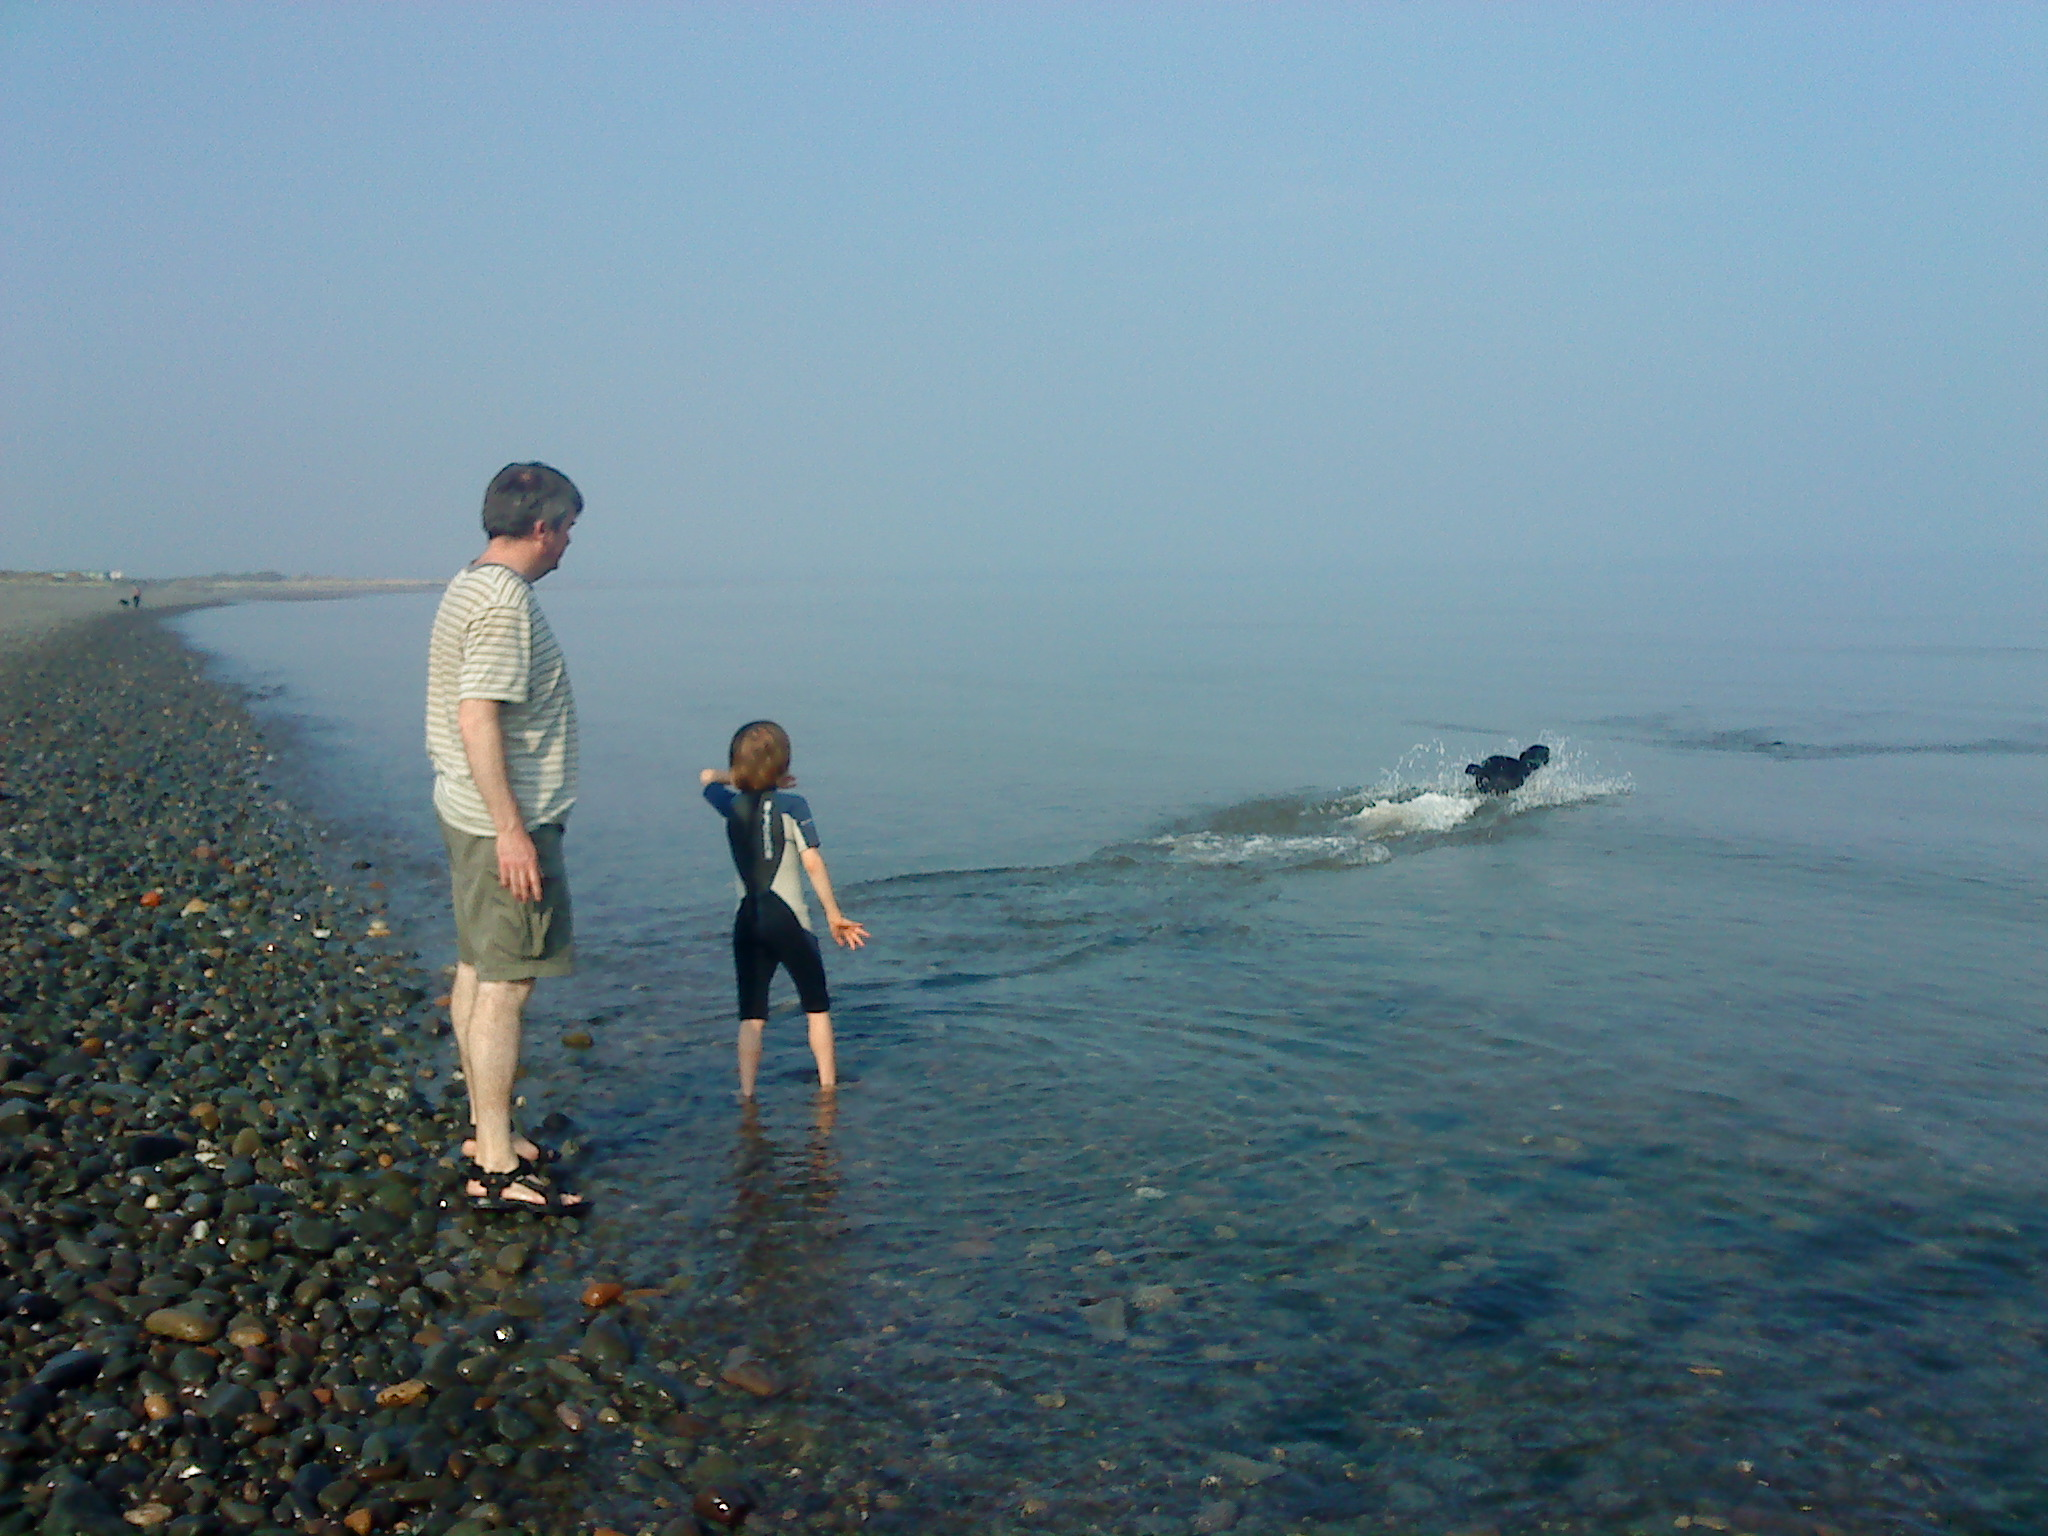 Wanda chasing a pebble thrown into sea